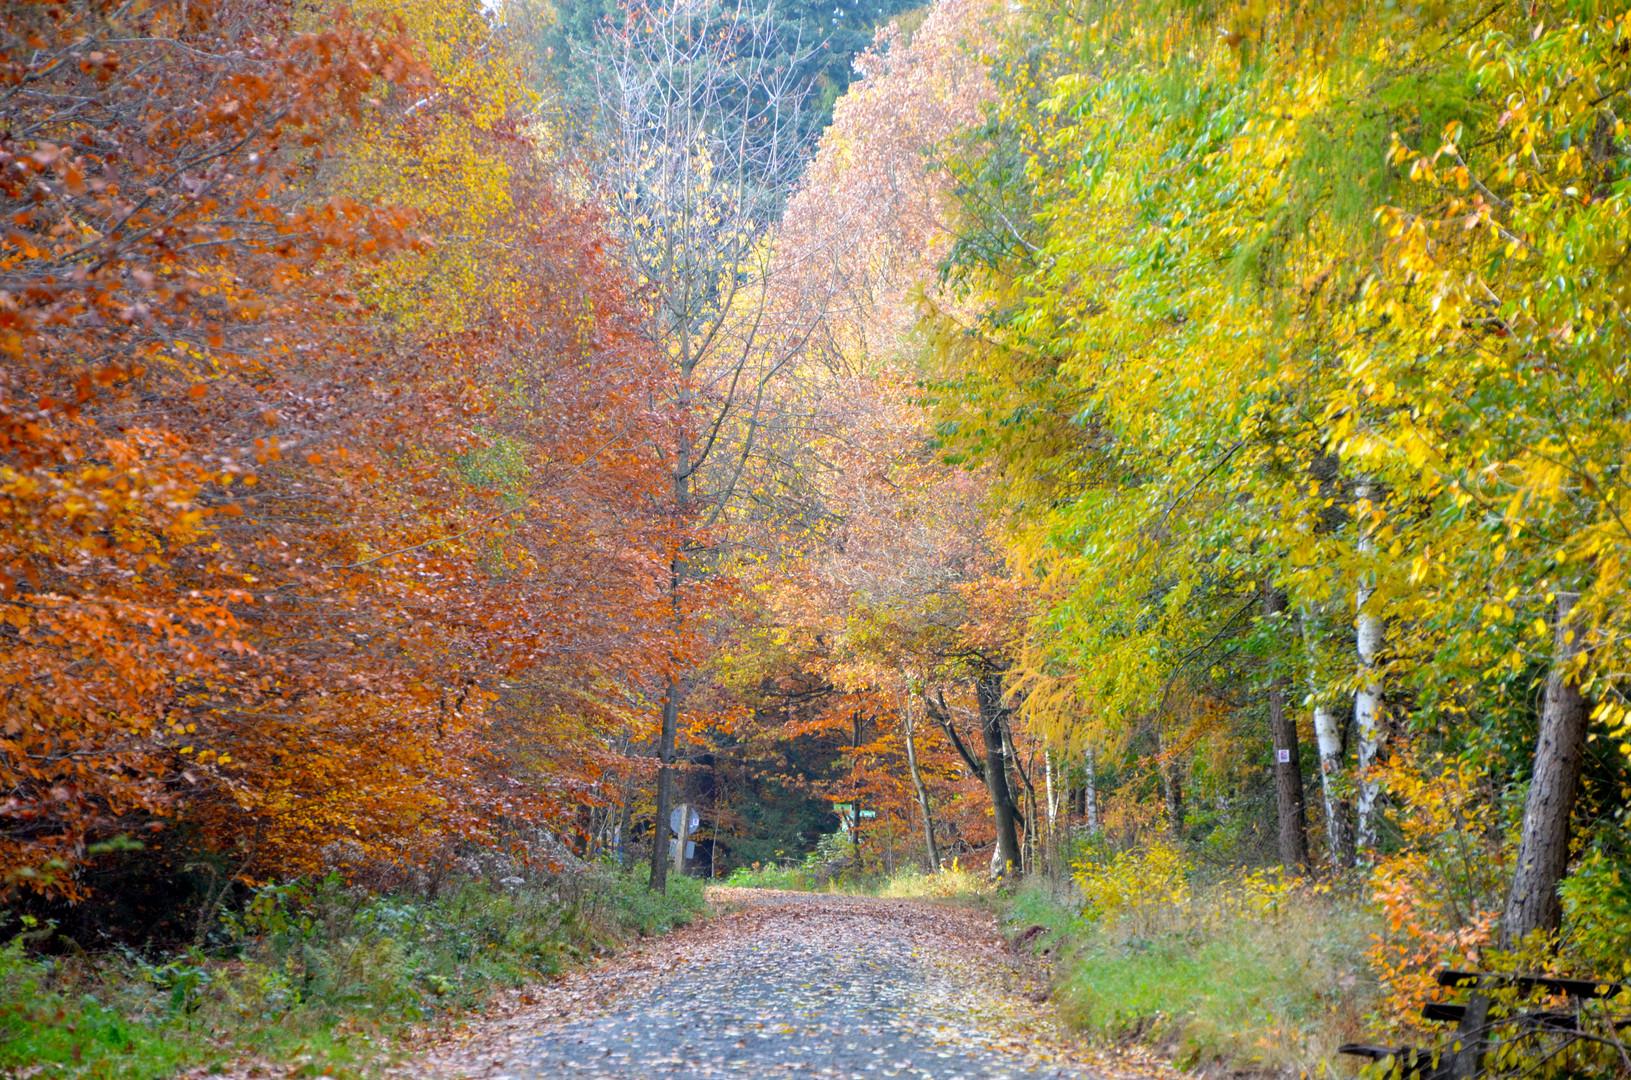 Weg im Herbstwald 2